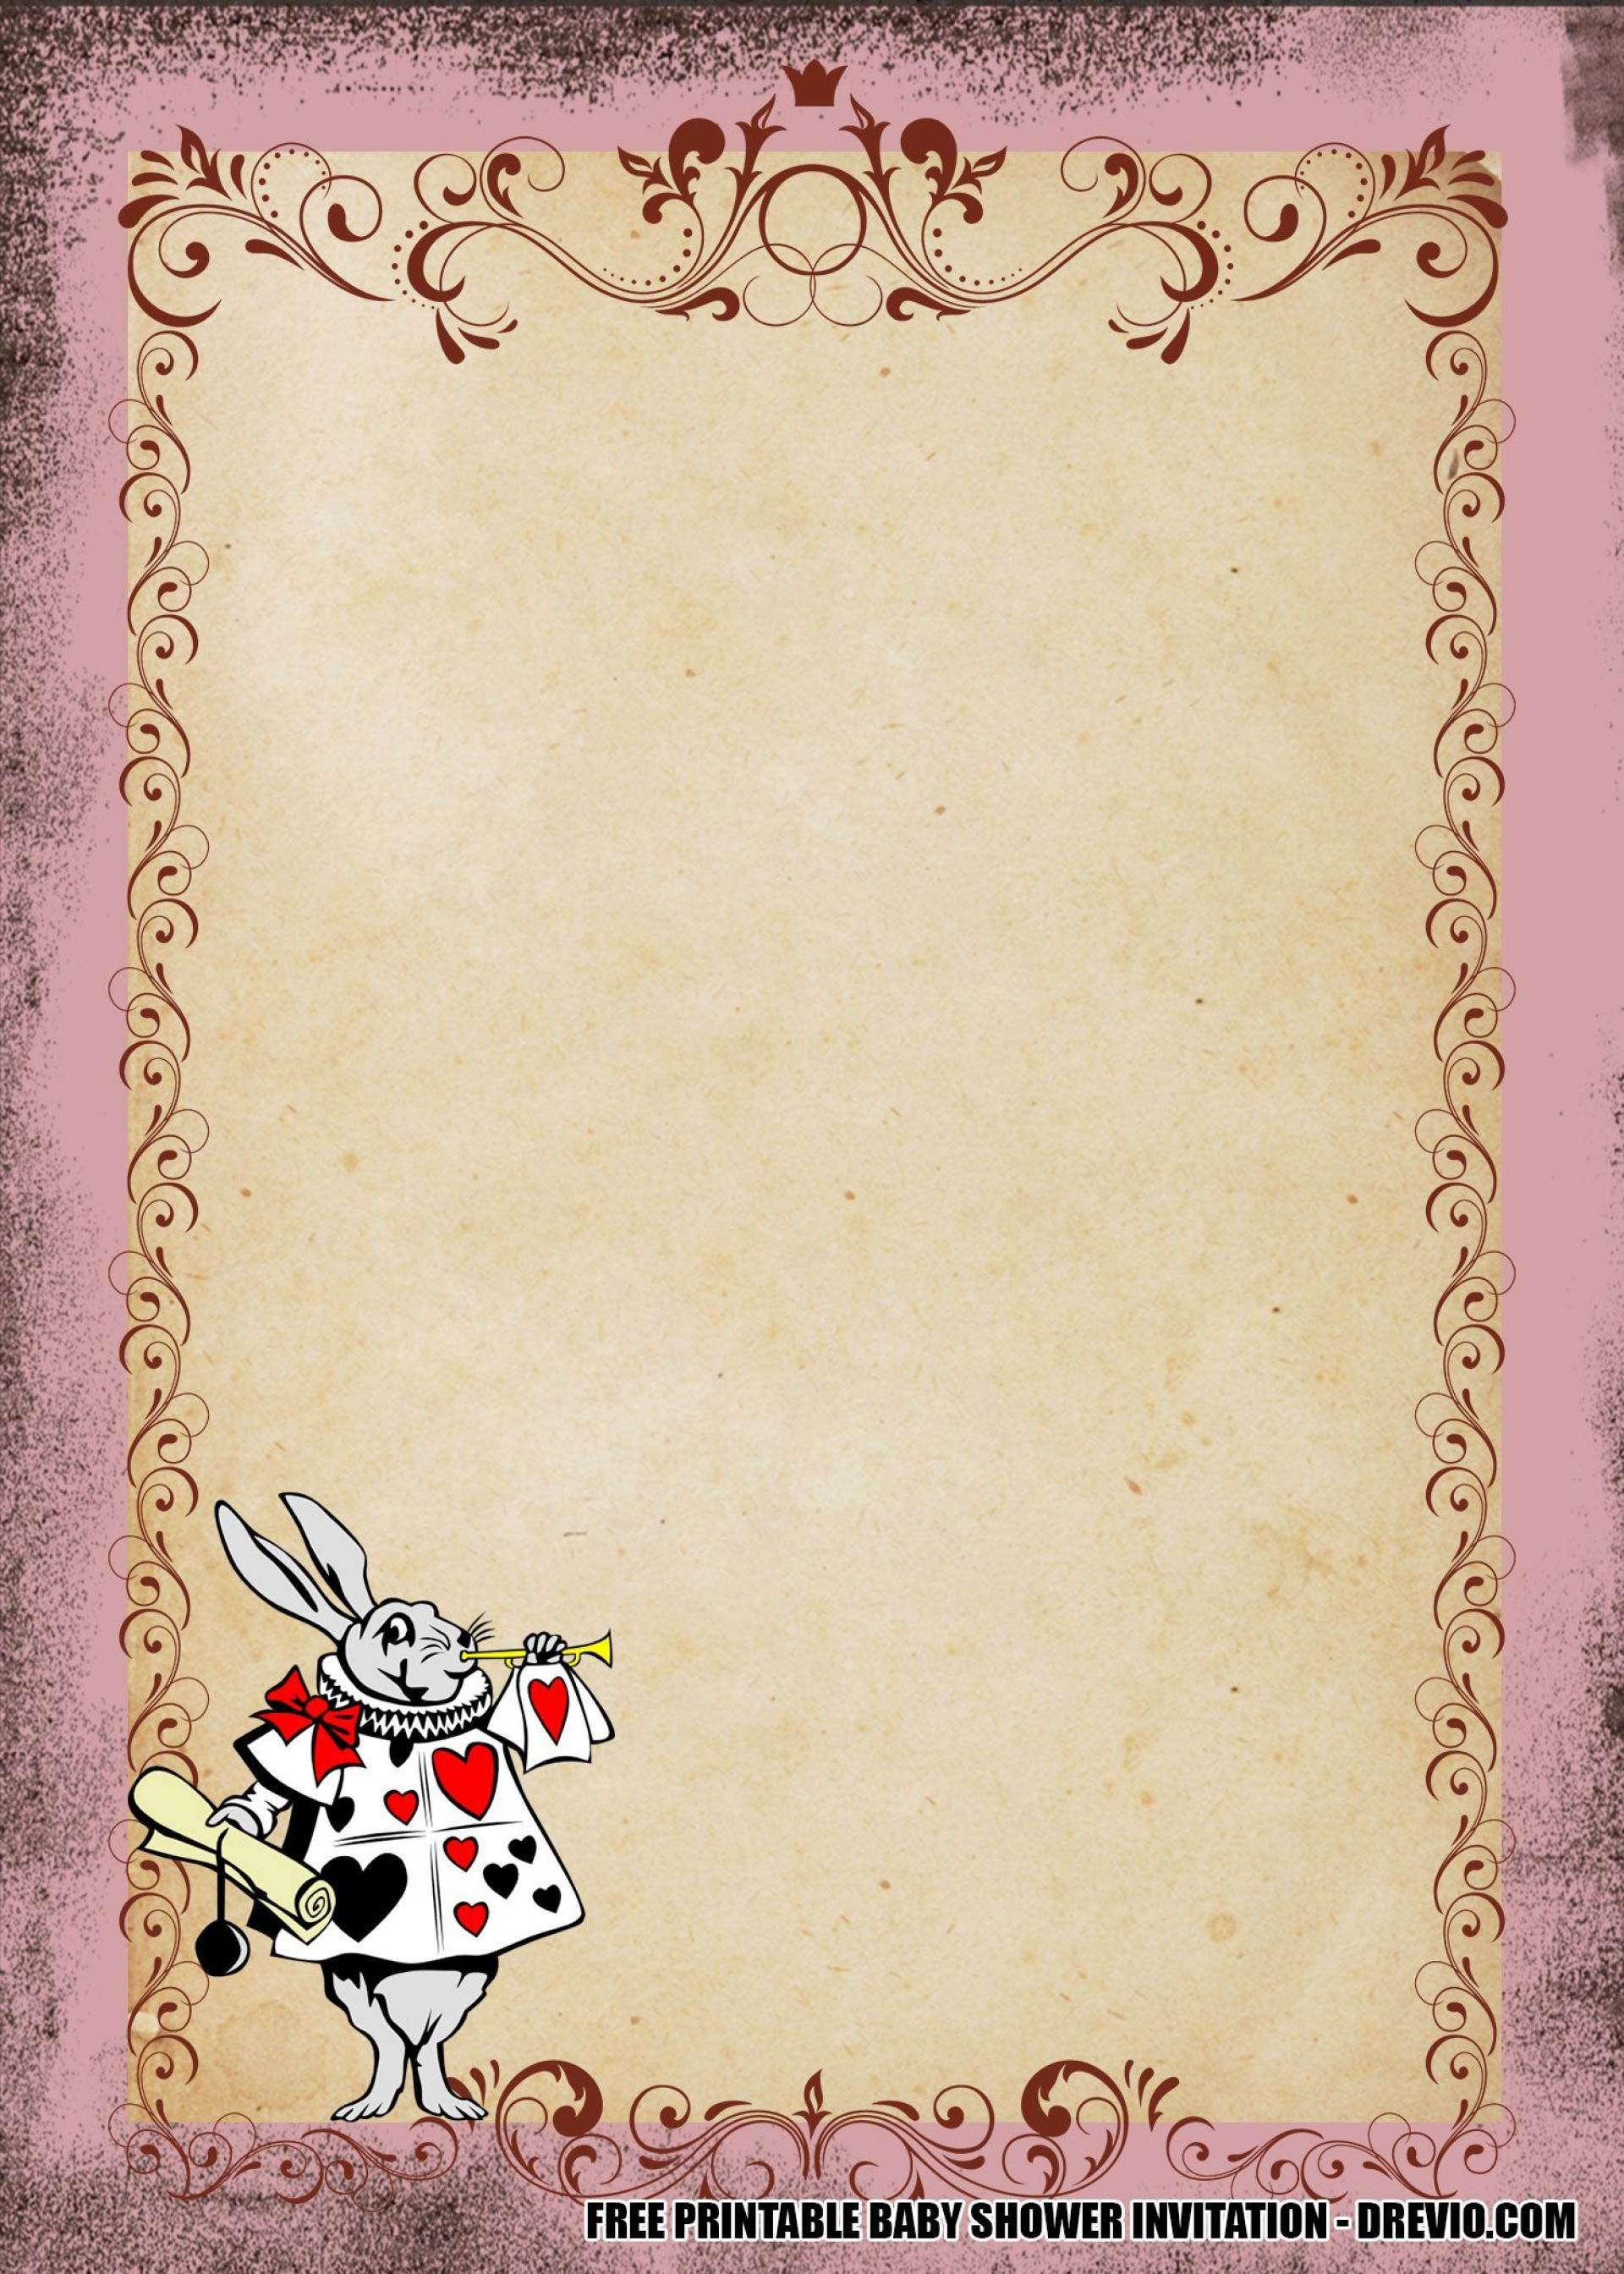 008 Imposing Alice In Wonderland Invitation Template High Resolution  Templates Wedding Birthday Free Tea Party1920